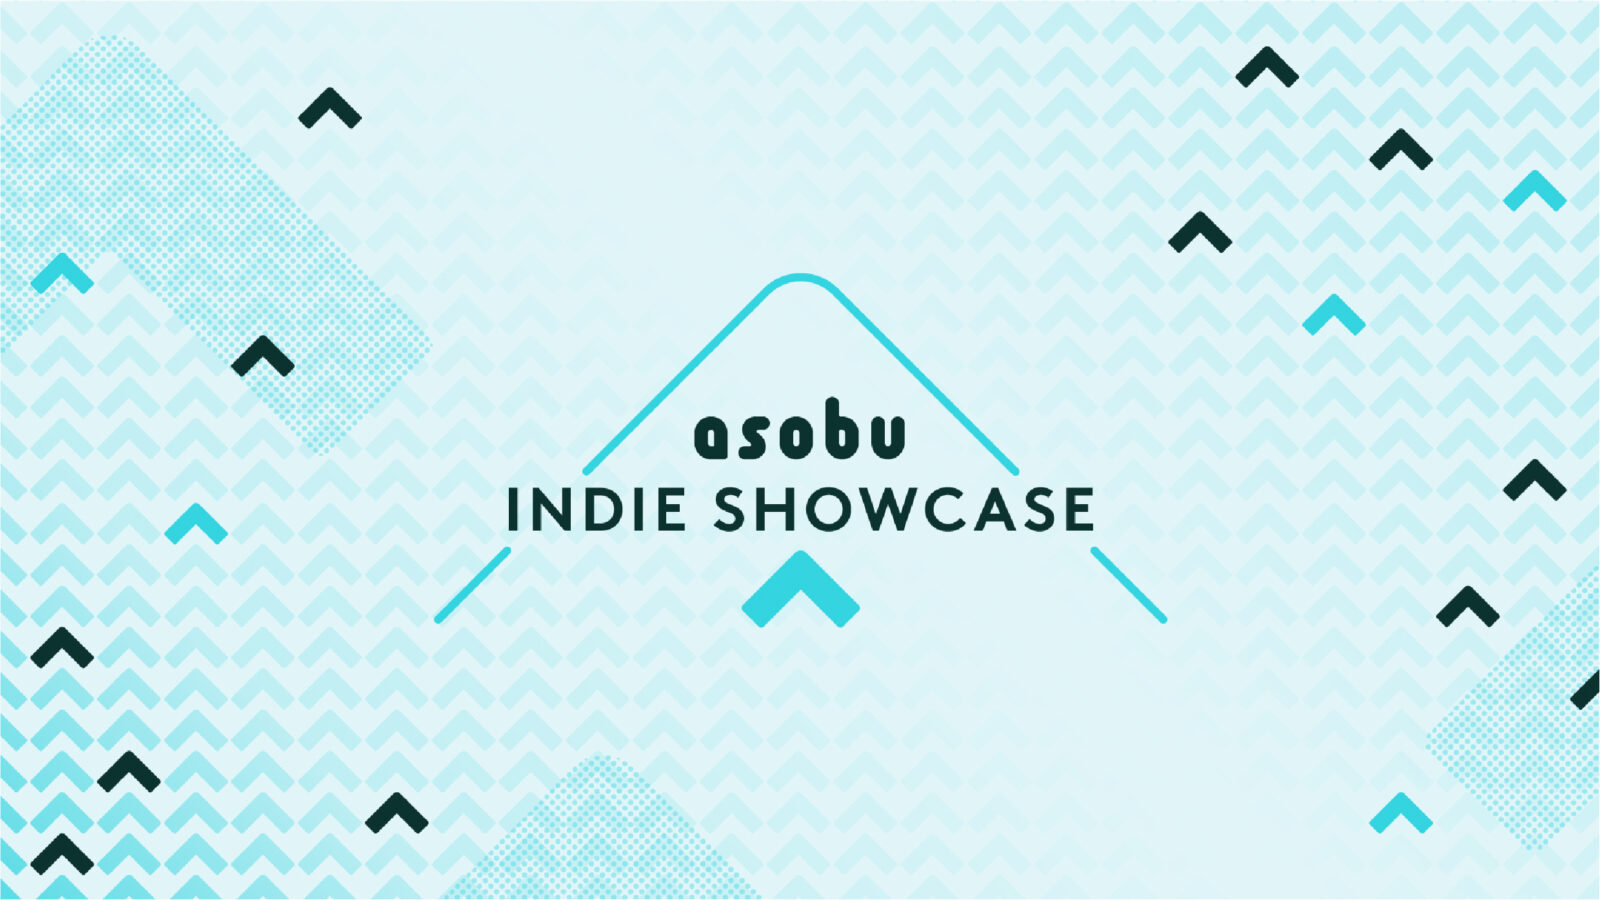 Asobu Indie Showcase: September 21, 2020